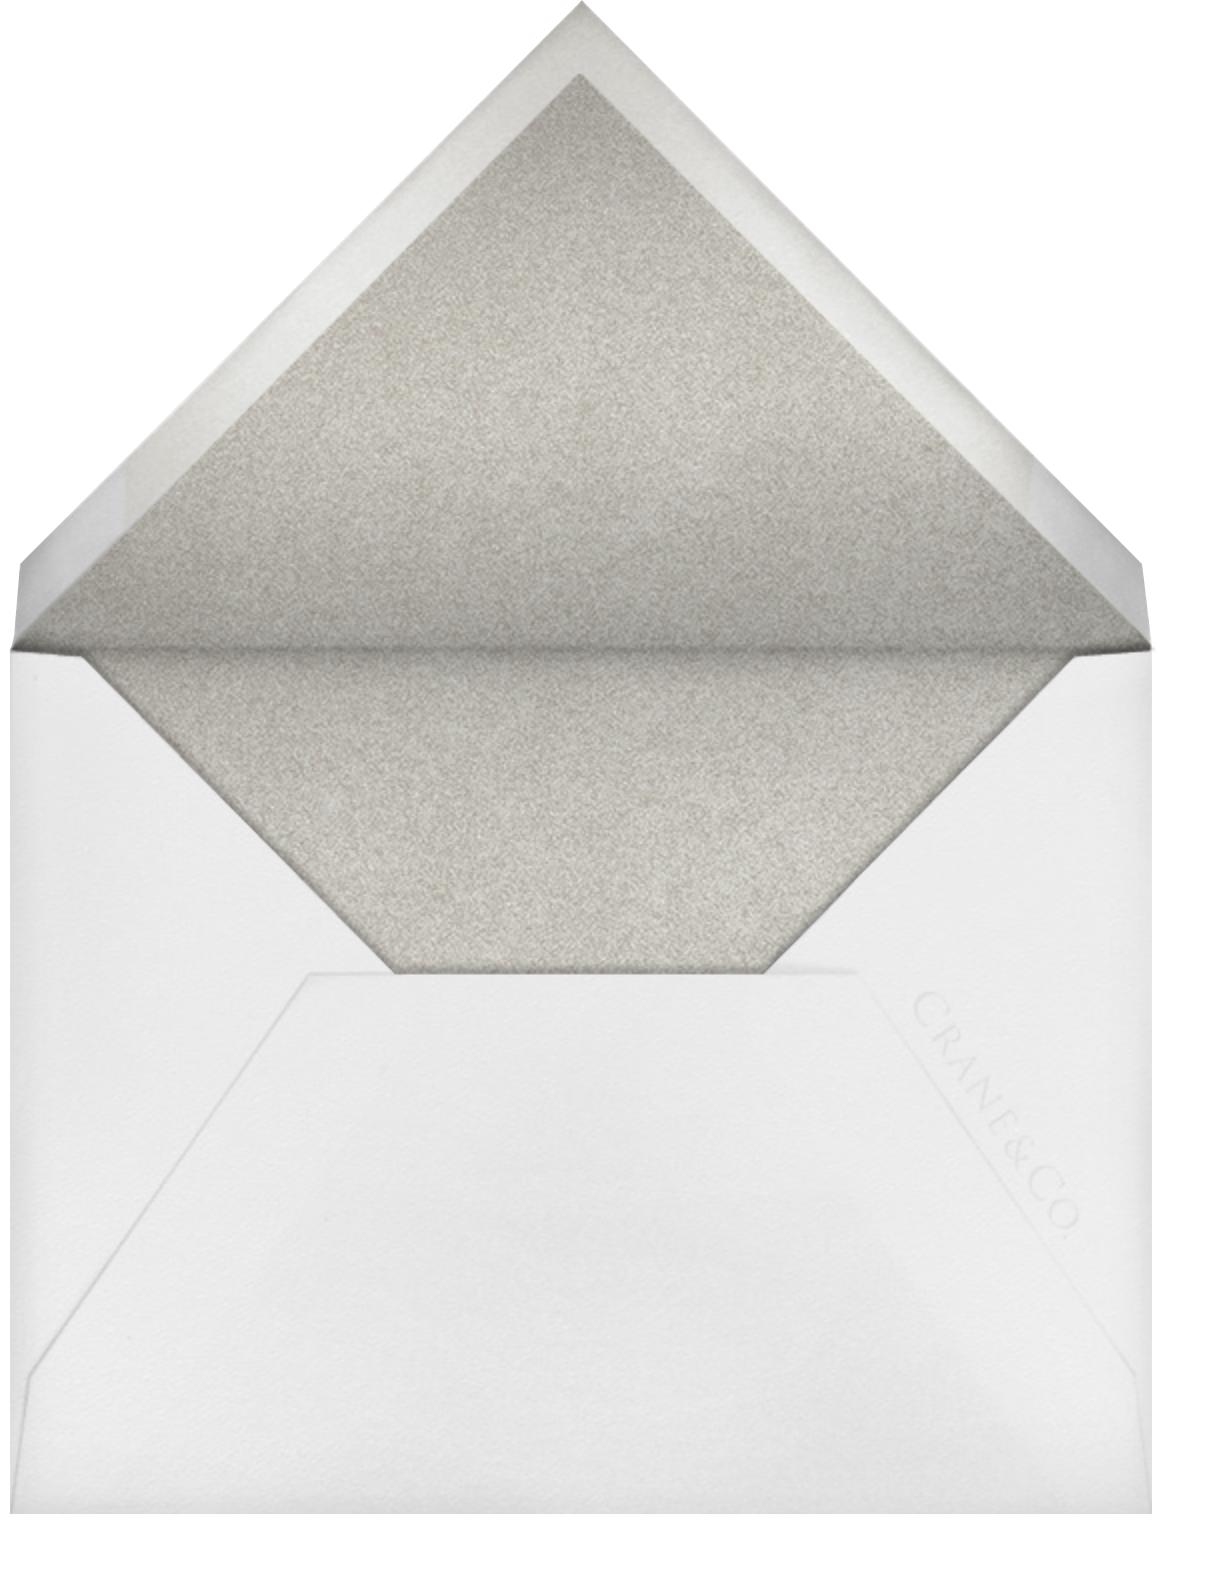 Hydrangea Lace II - Platinum - Oscar de la Renta - All - envelope back